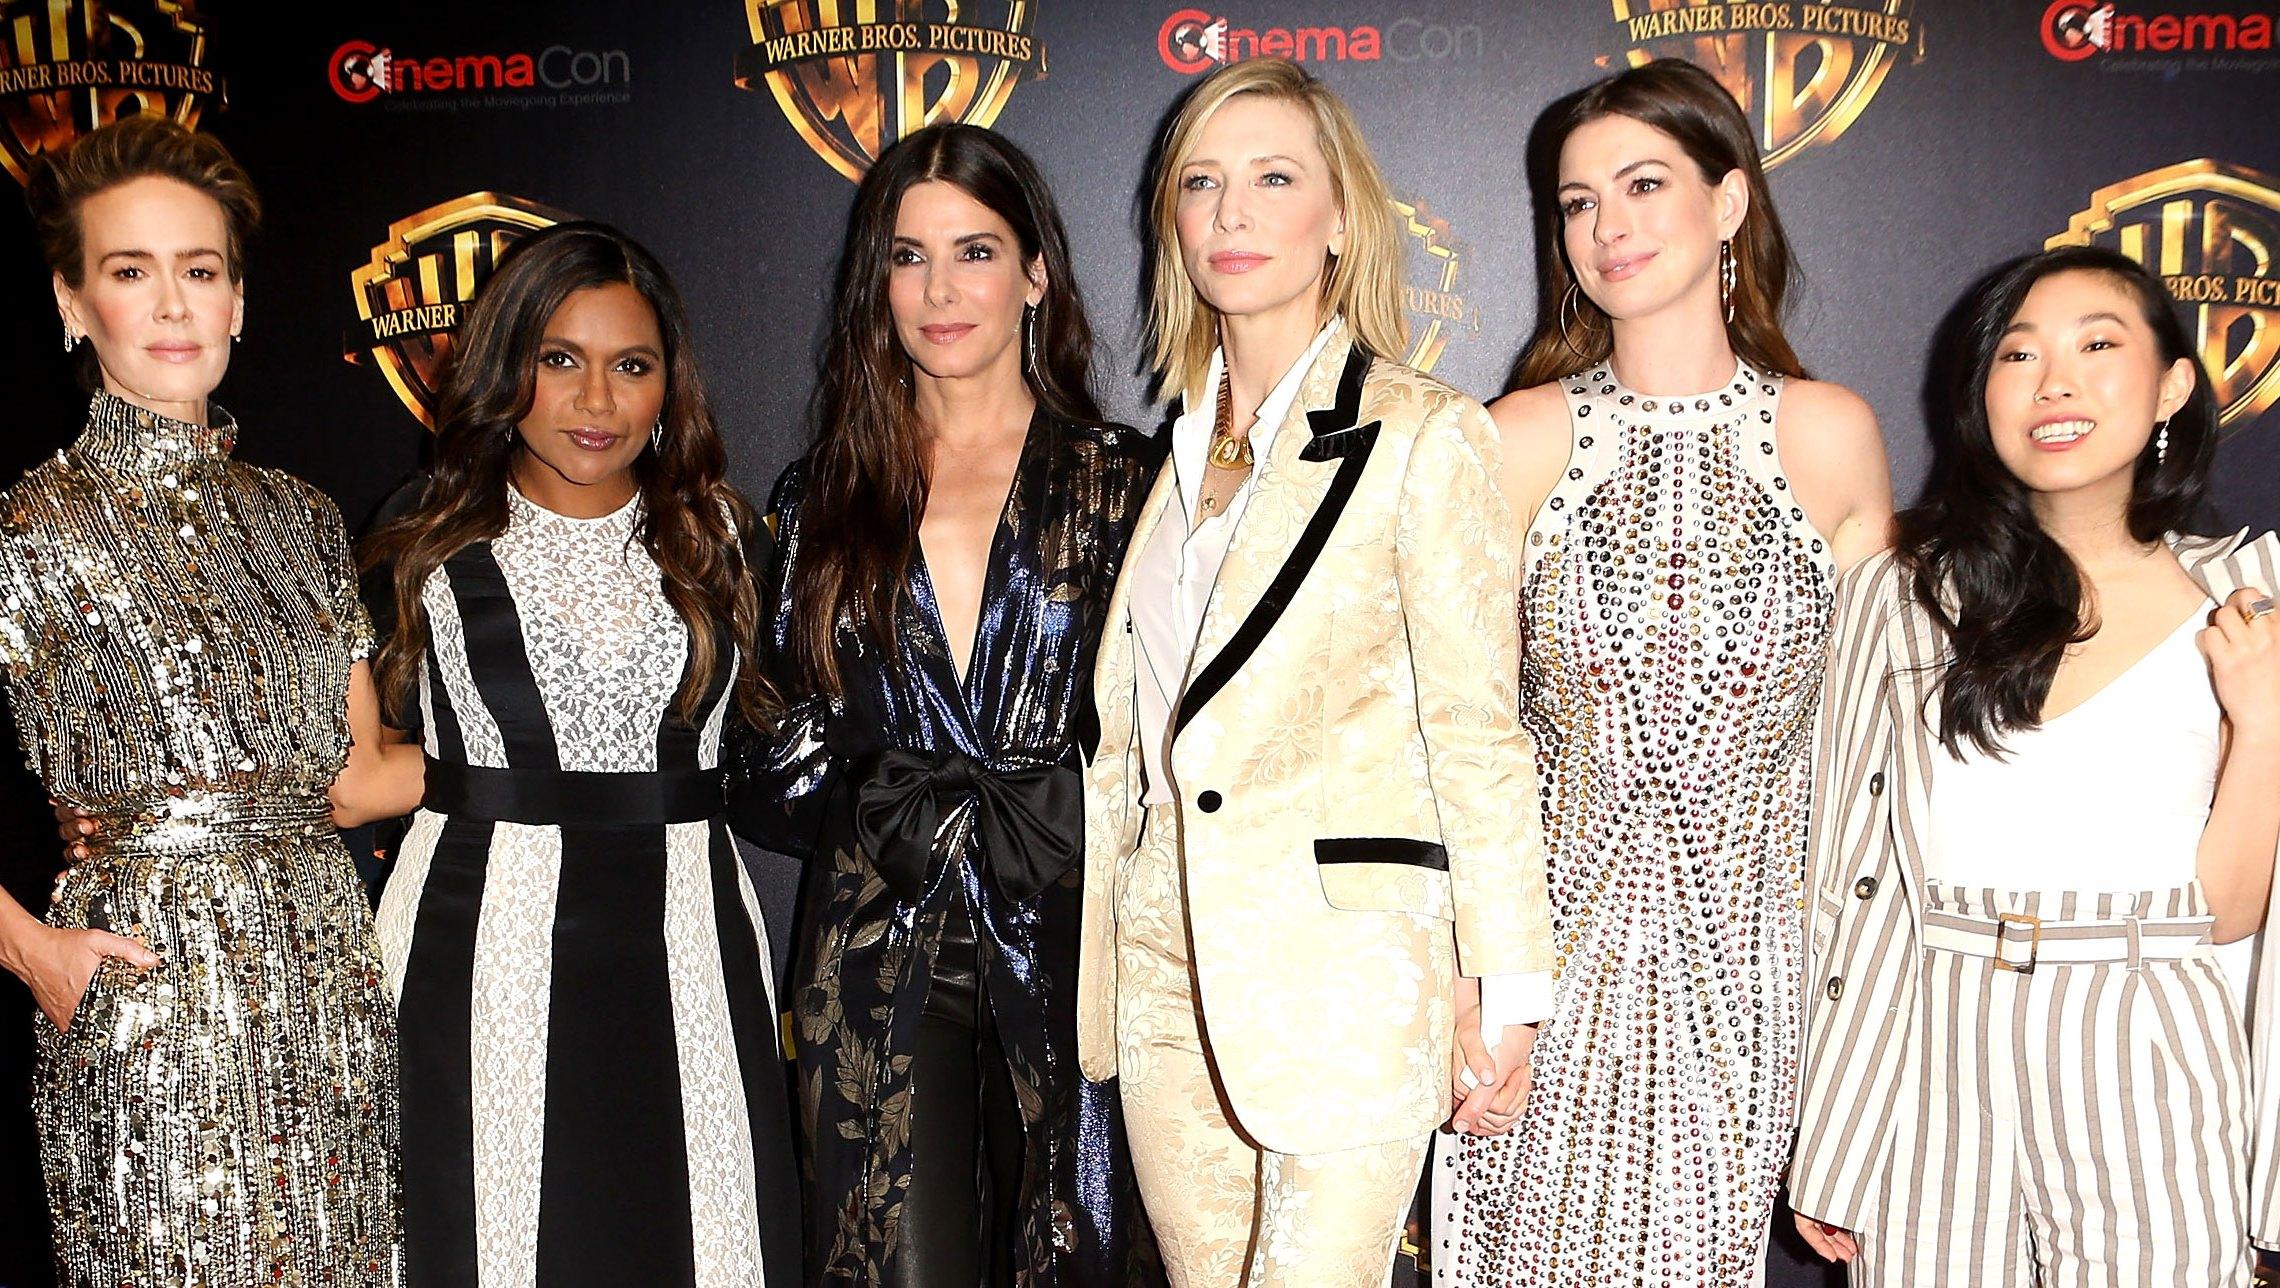 Sarah Paulson, Mindy Kaling, Sandra Bullock, Cate Blanchett, Anne Hathaway